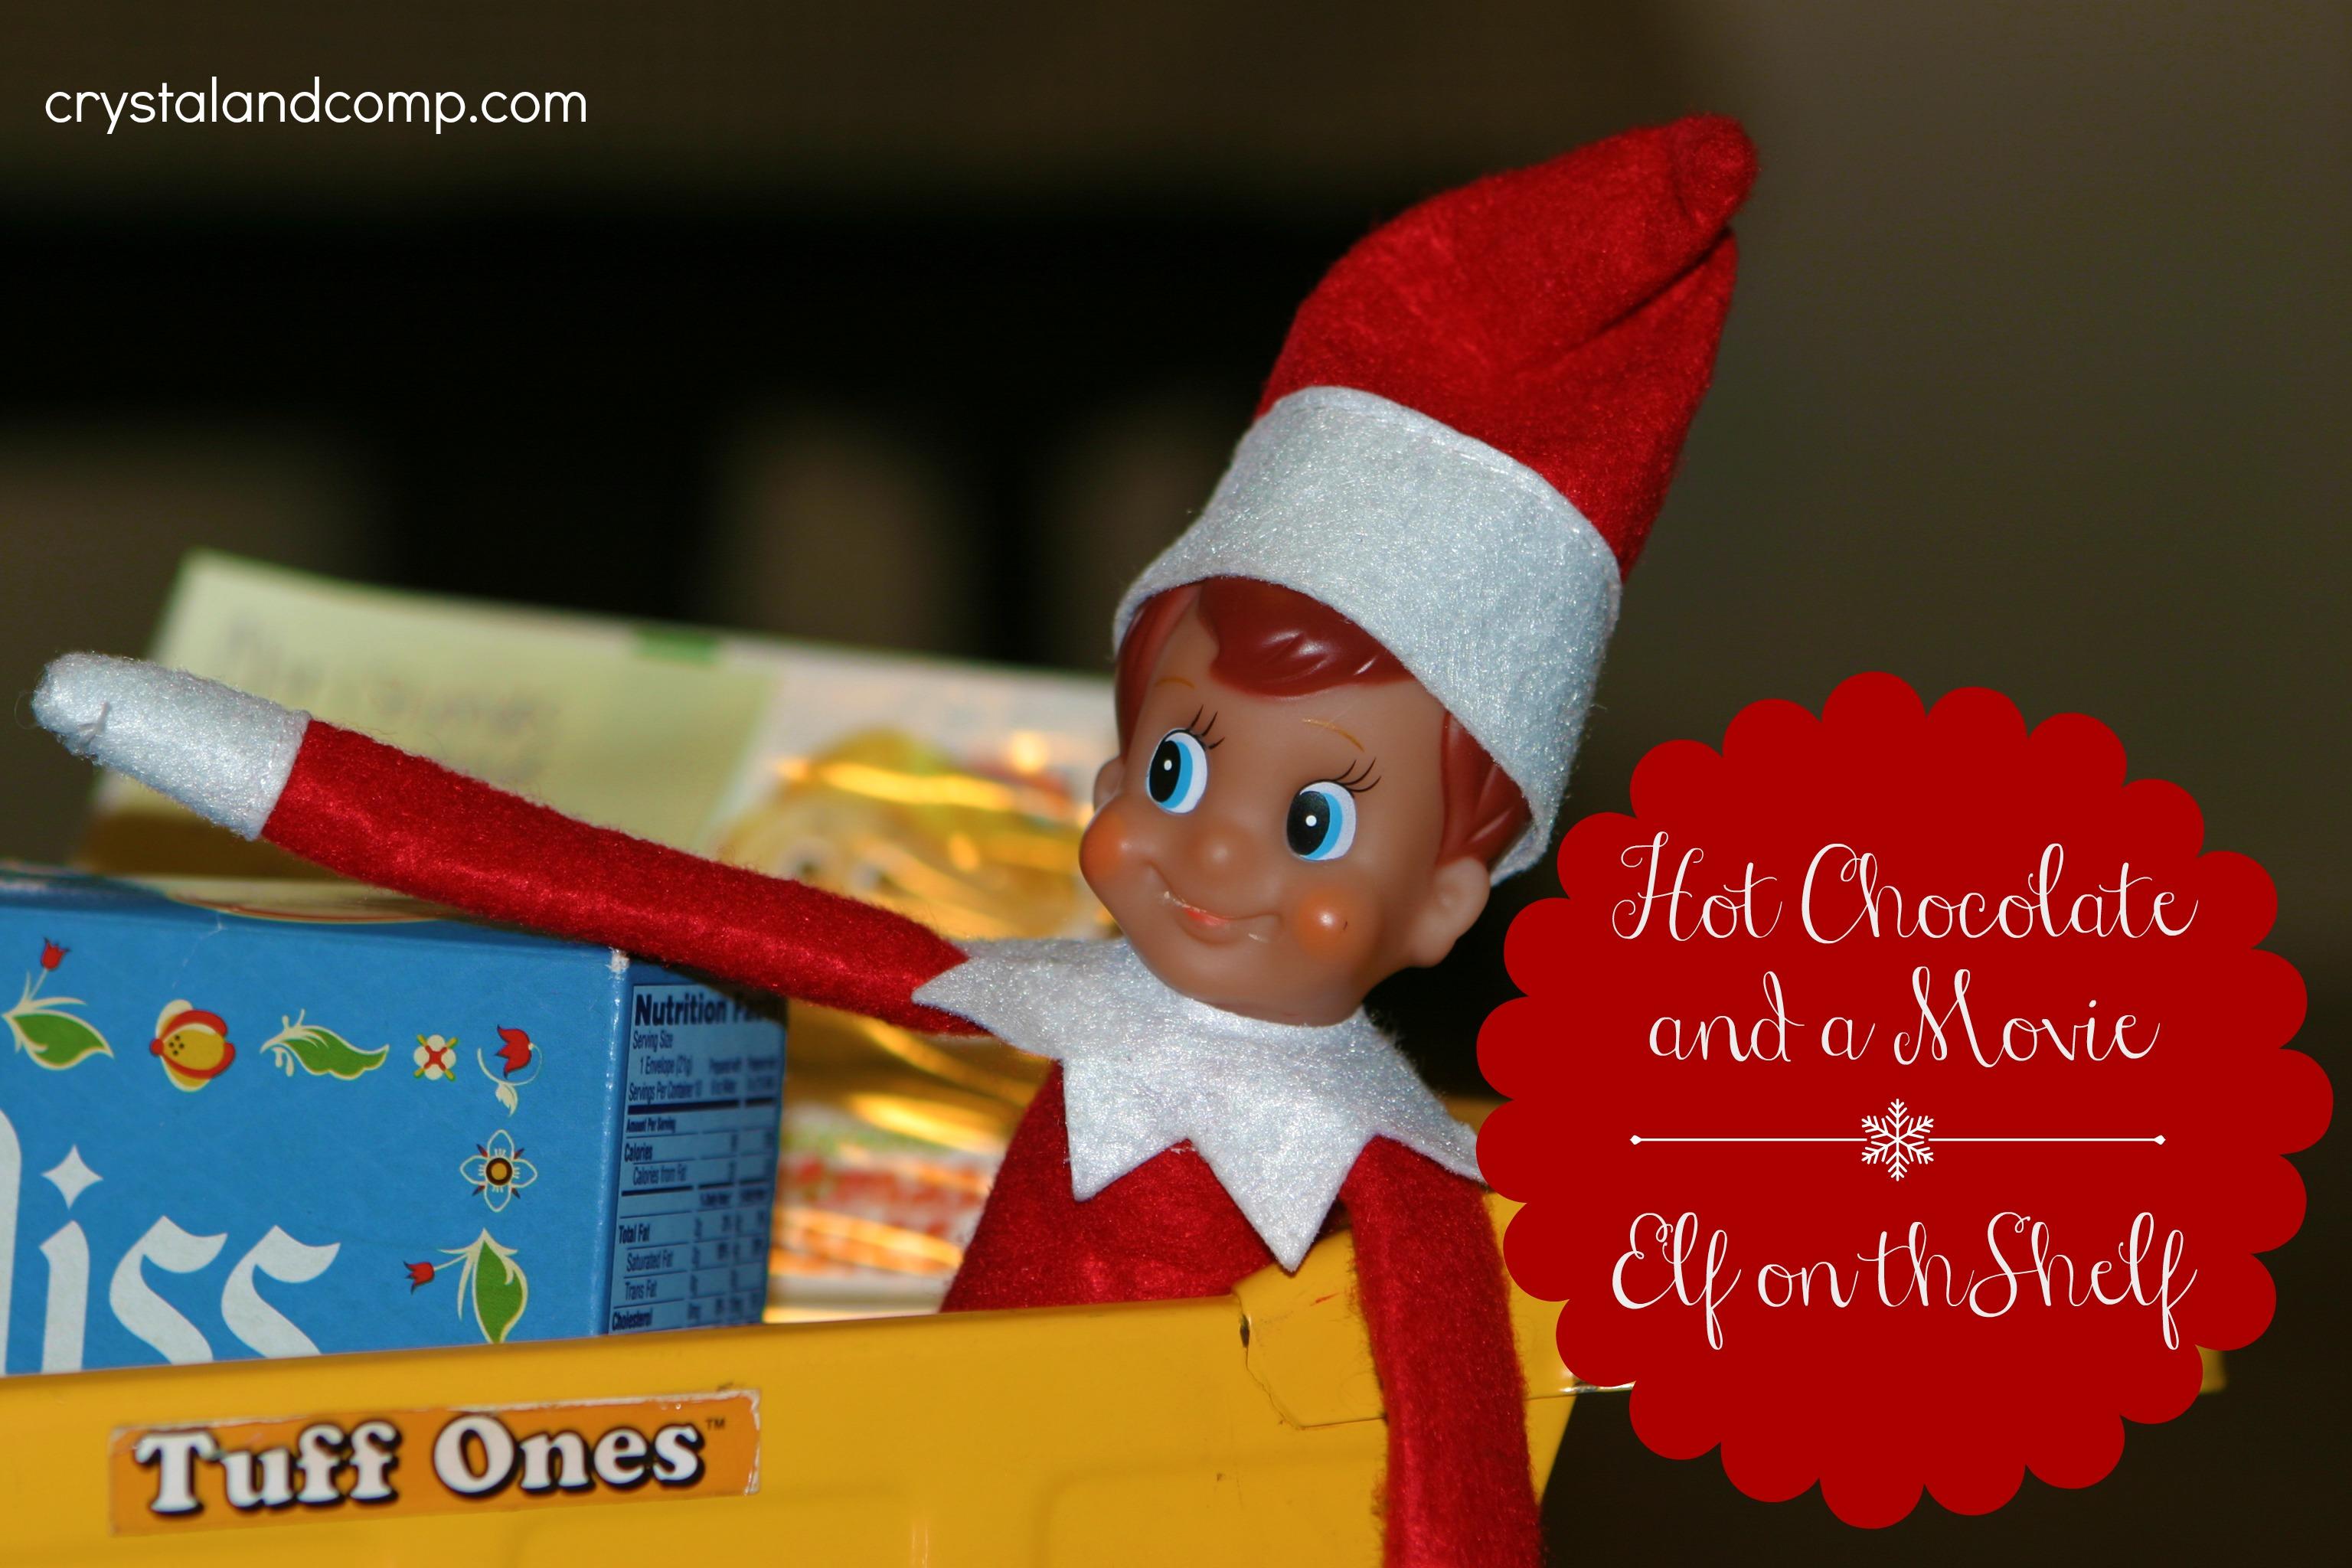 Elf on the Shelf: Hot Chocolate and a Movie | CrystalandComp.com